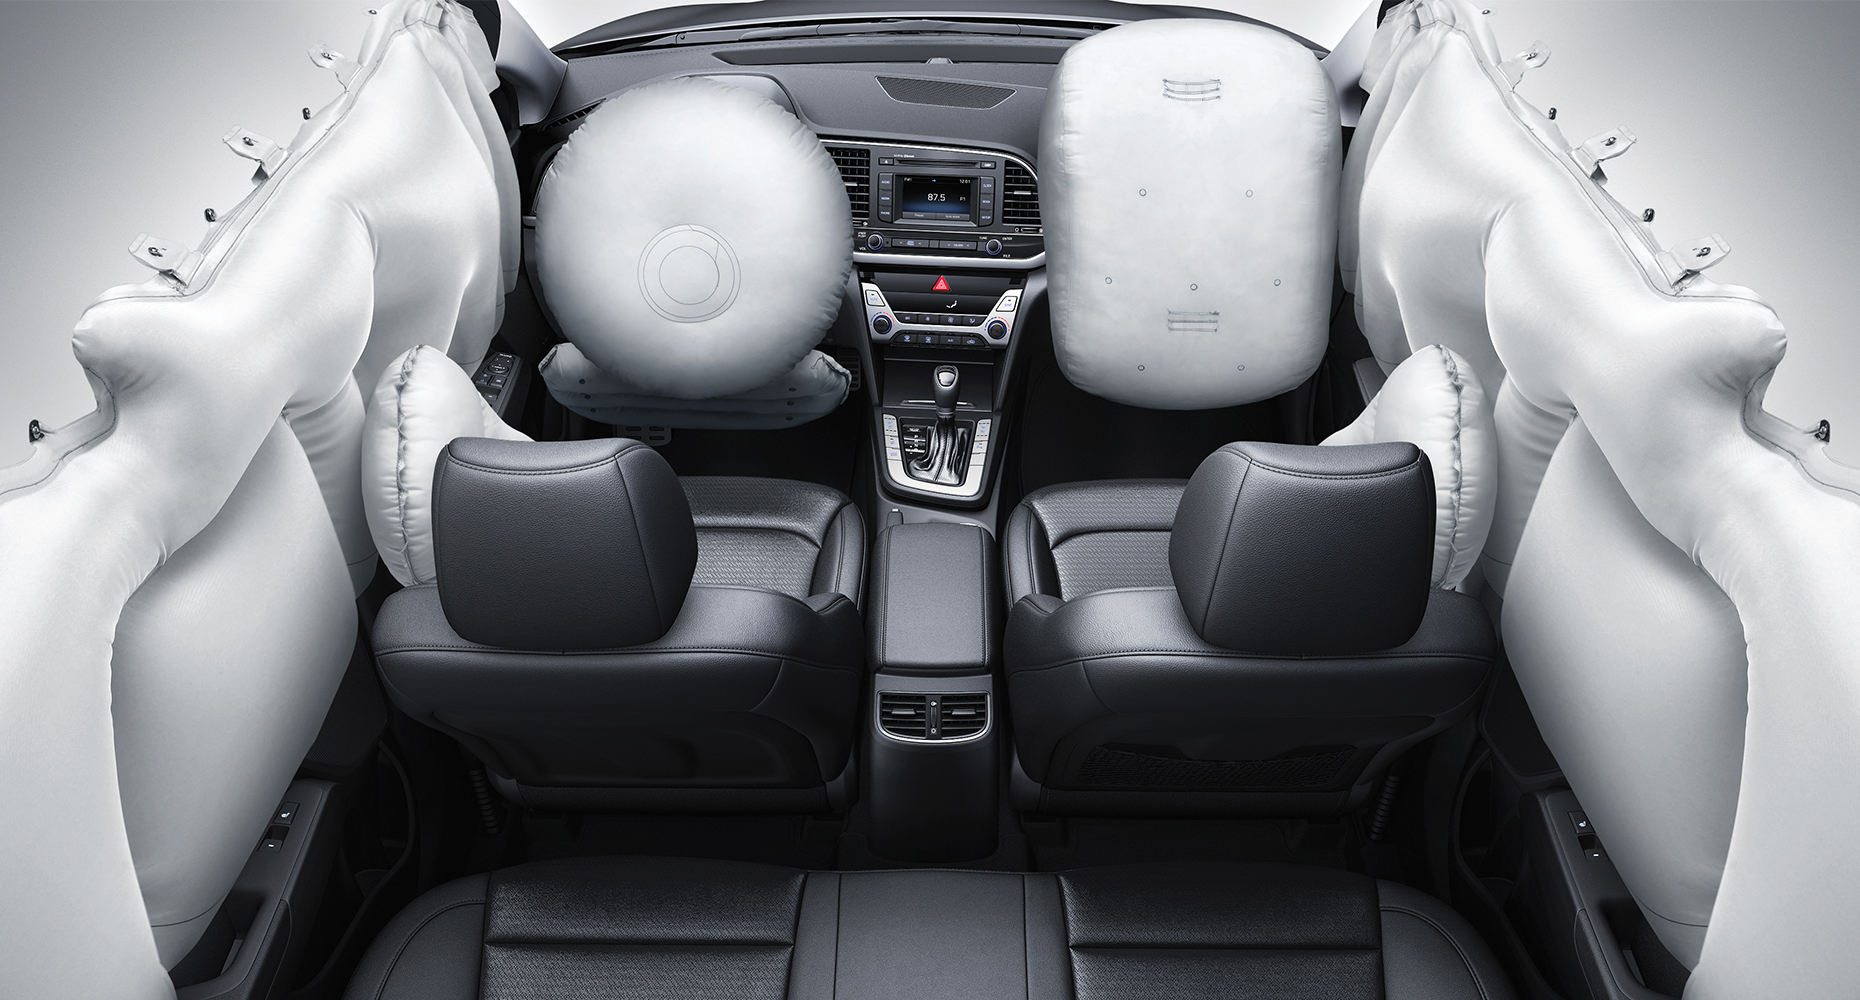 2018 Hyundai Elantra Safety Overview